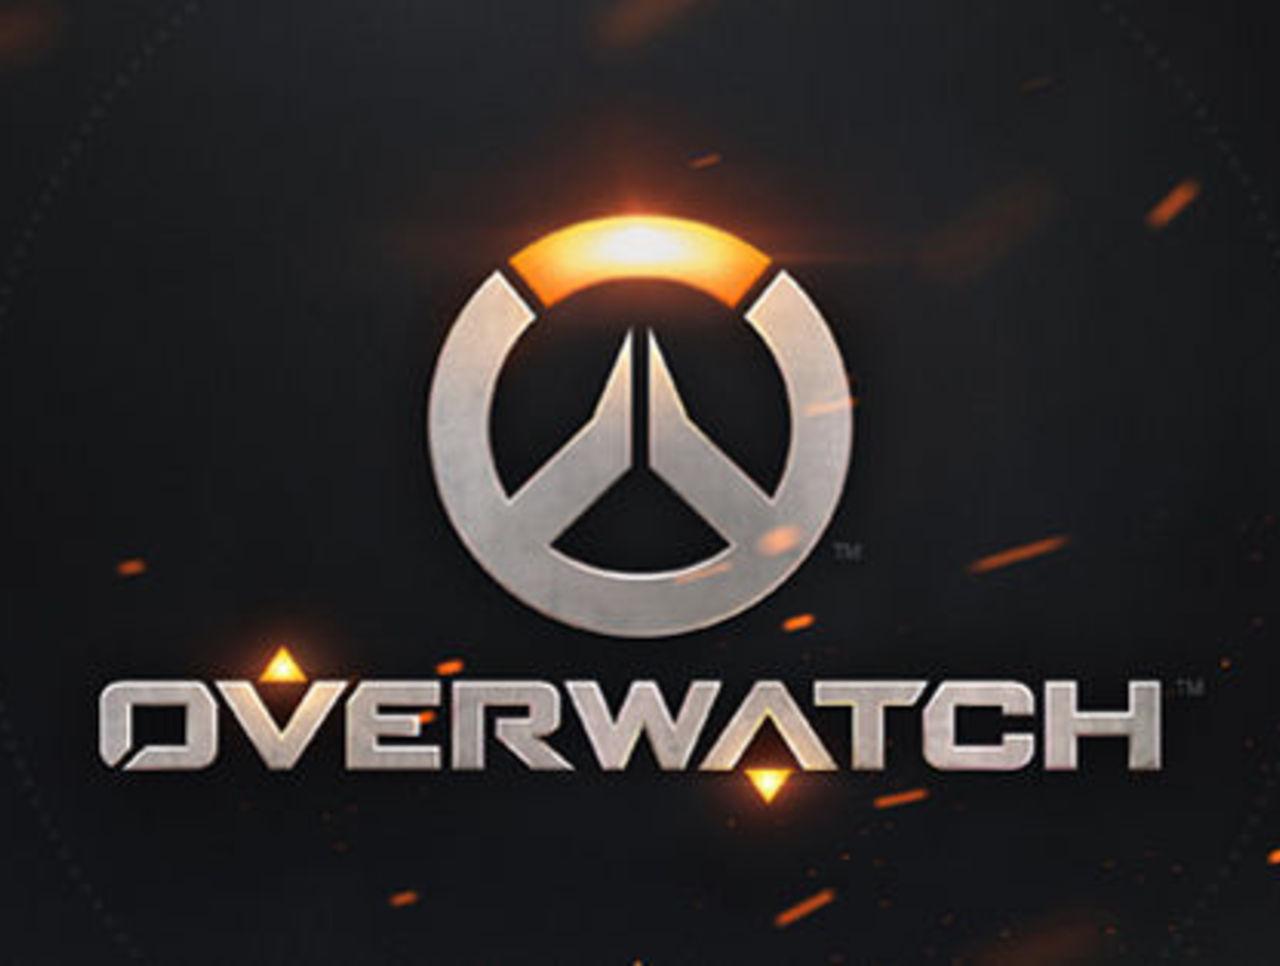 Cropped overwatch share 3d5a268515283007bdf3452e877adac466d579f4b44abbd05aa0a98aba582eeaebc4541f1154e57ec5a43693345bebda953381a7b75b58adbd29d3f3eb439ad2